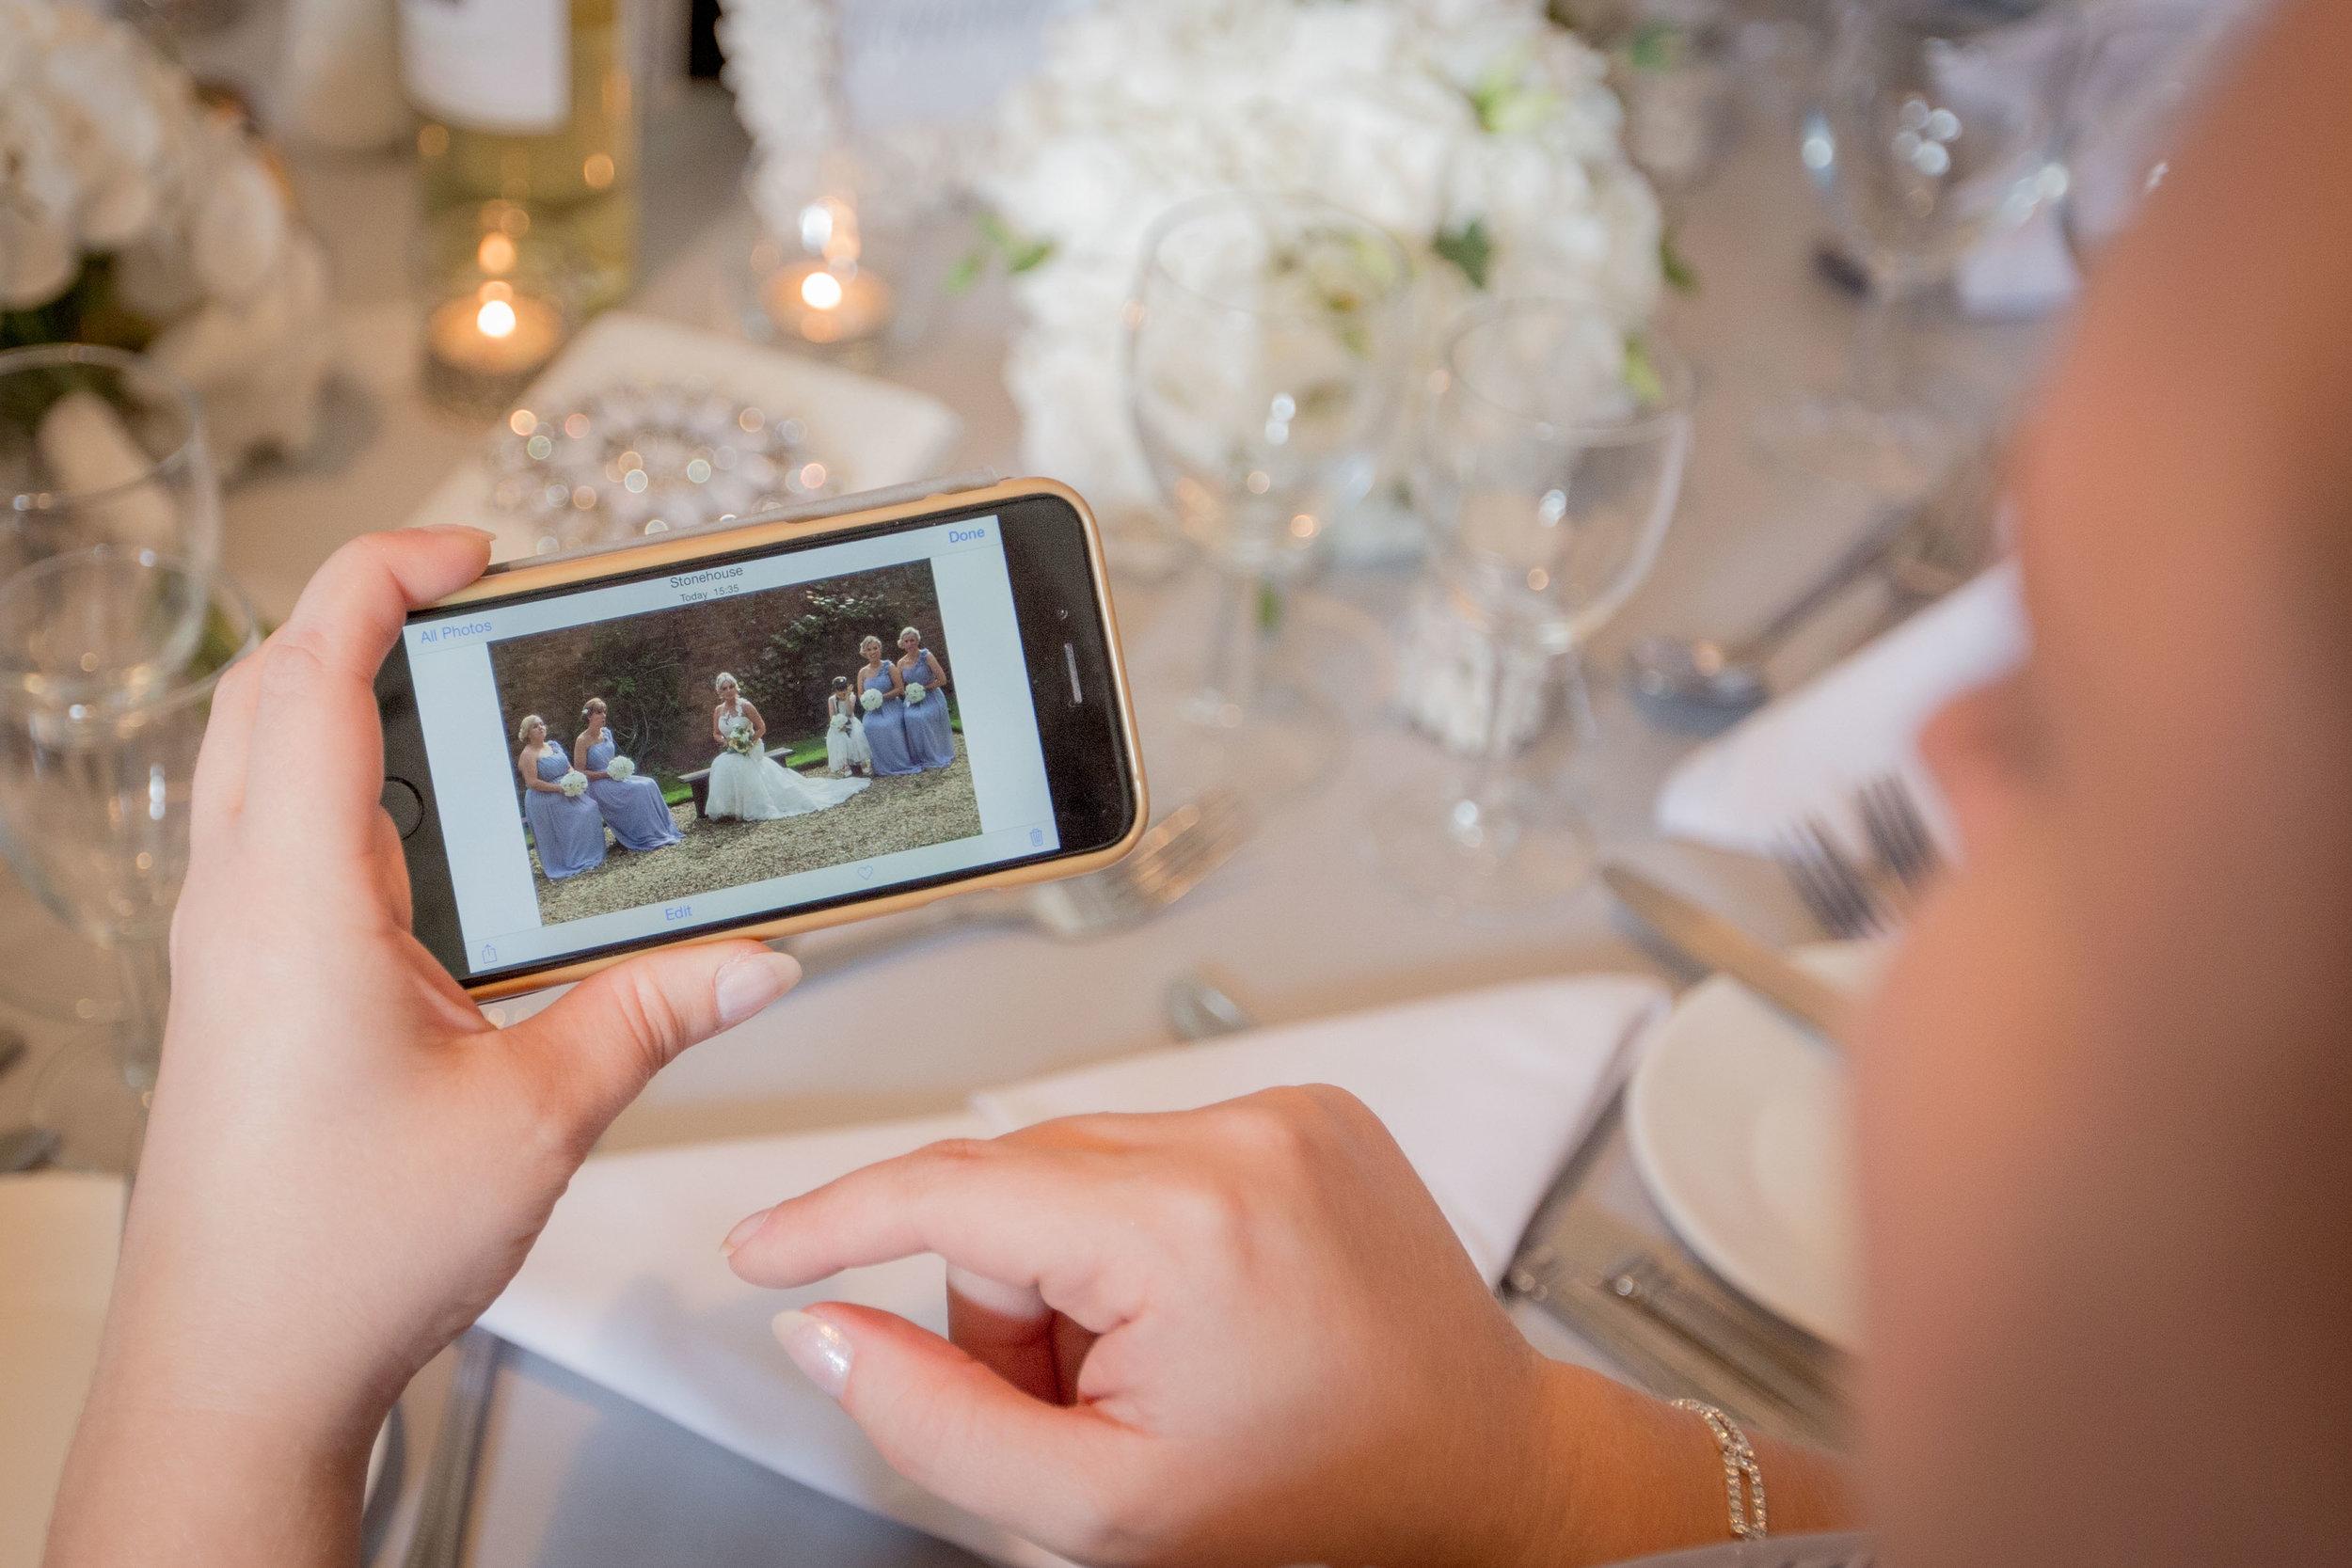 cotswold-wedding-photography-at-stonehouse-court-hotel-natalia-smith-photography-gloucestershire-wedding-photographer-62.jpg